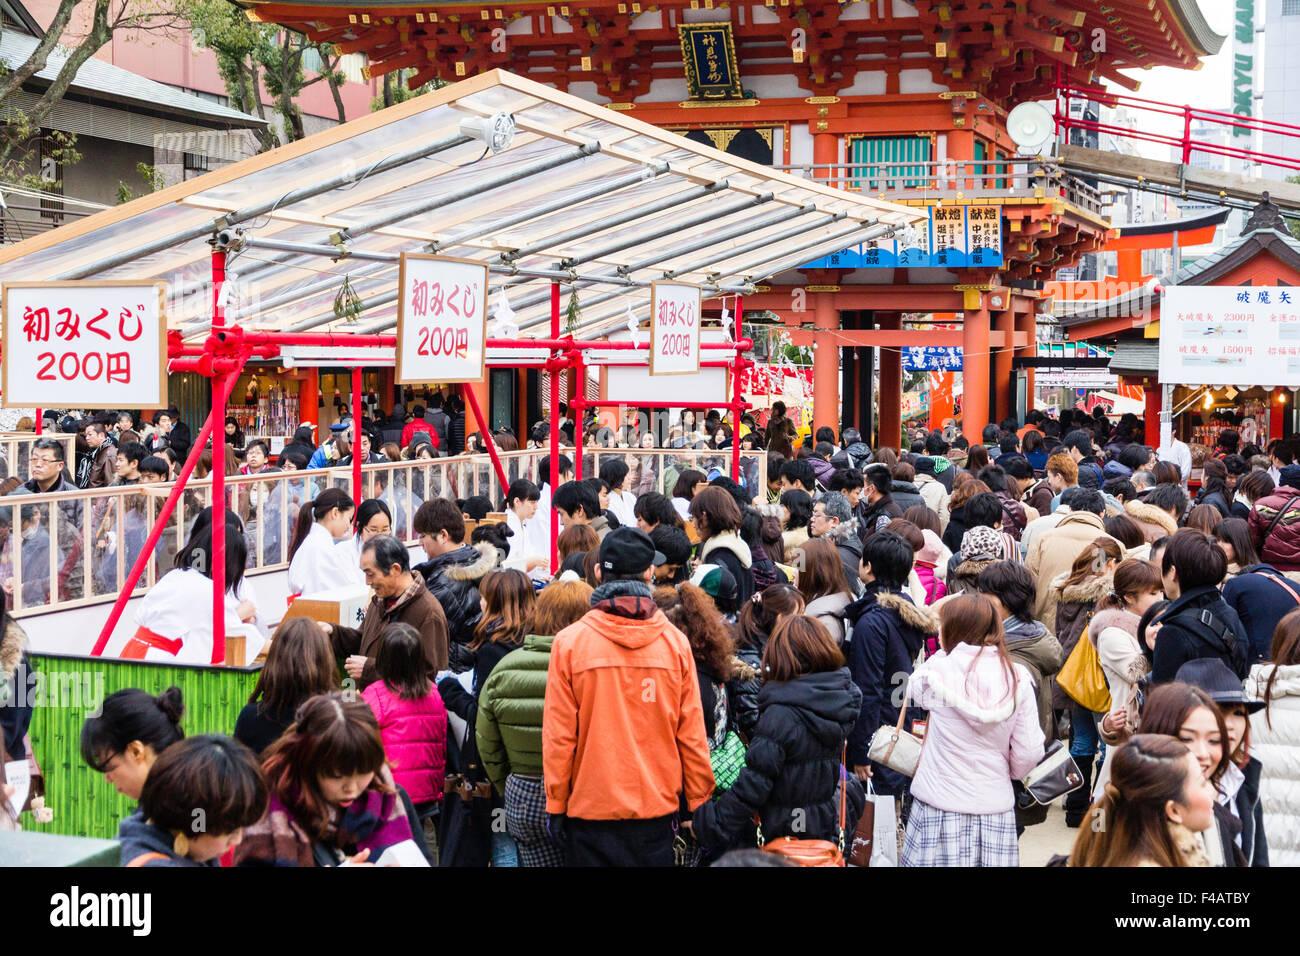 Ikuta shrine, Kobe. New Year. Crowds filling the shrine buying fortune papers, omikuji, from Miko, shrine maidens - Stock Image